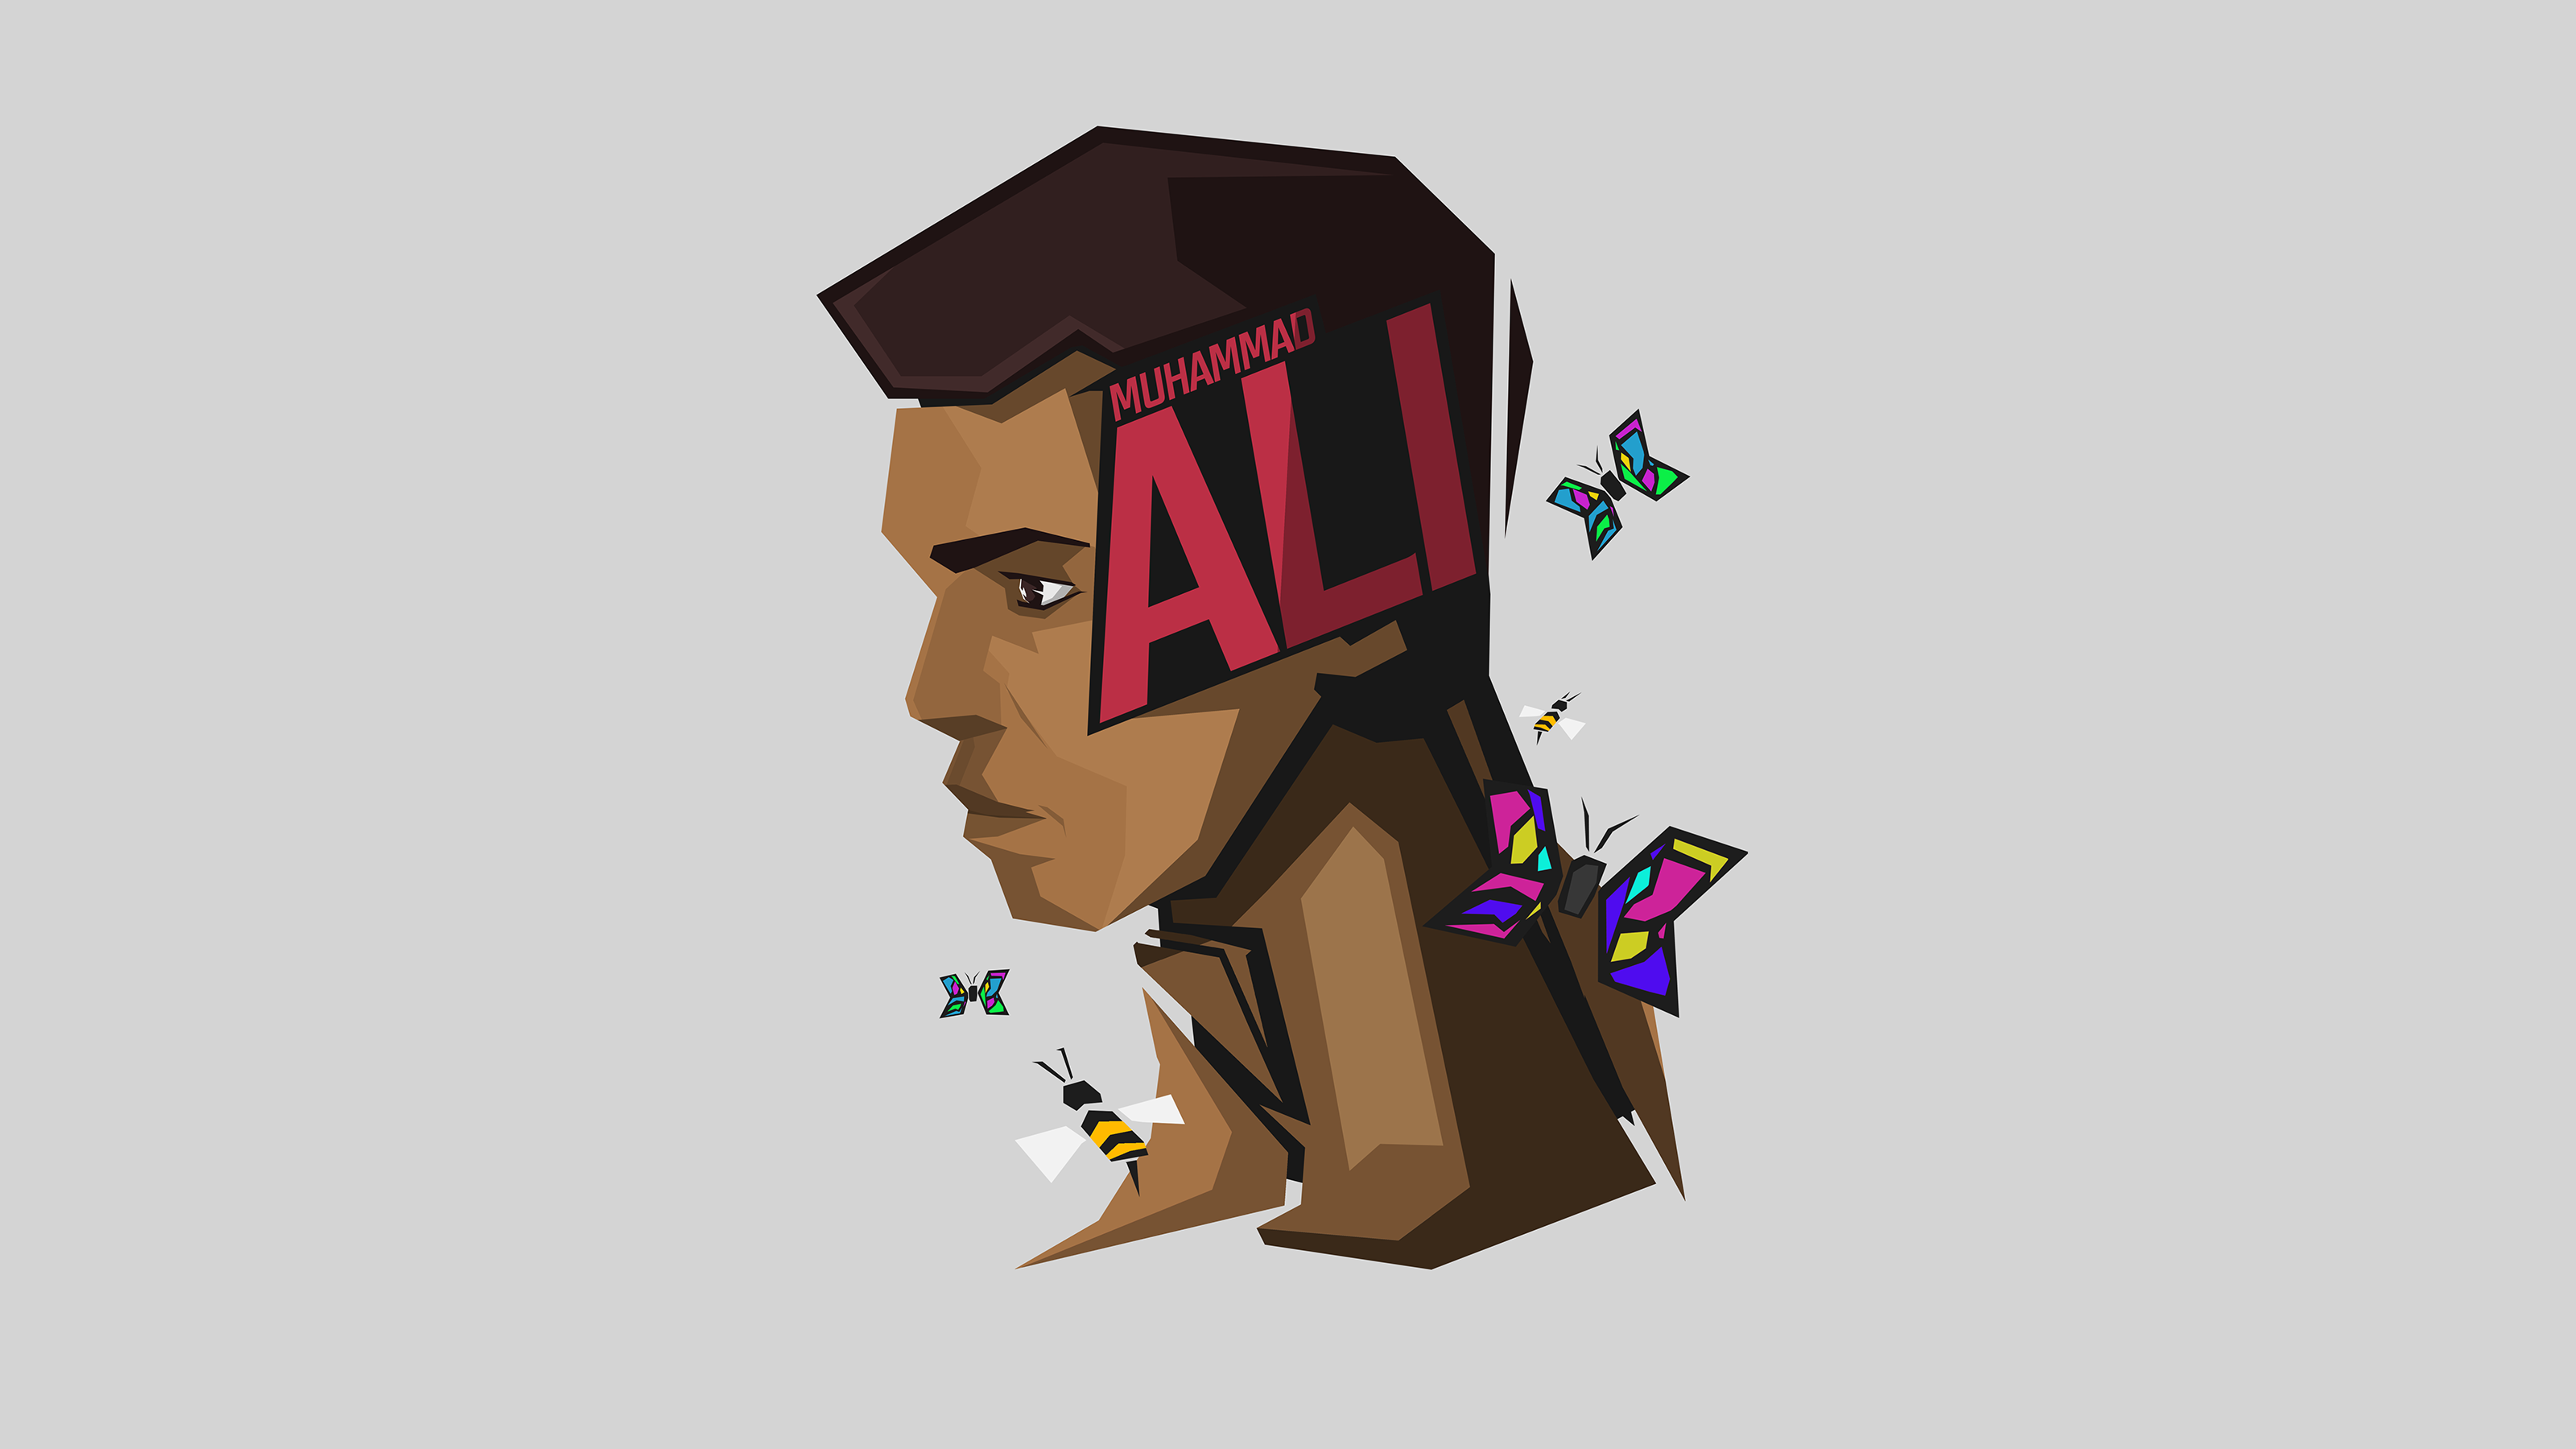 Muhammad Ali 8k Ultra Hd Wallpaper Background Image